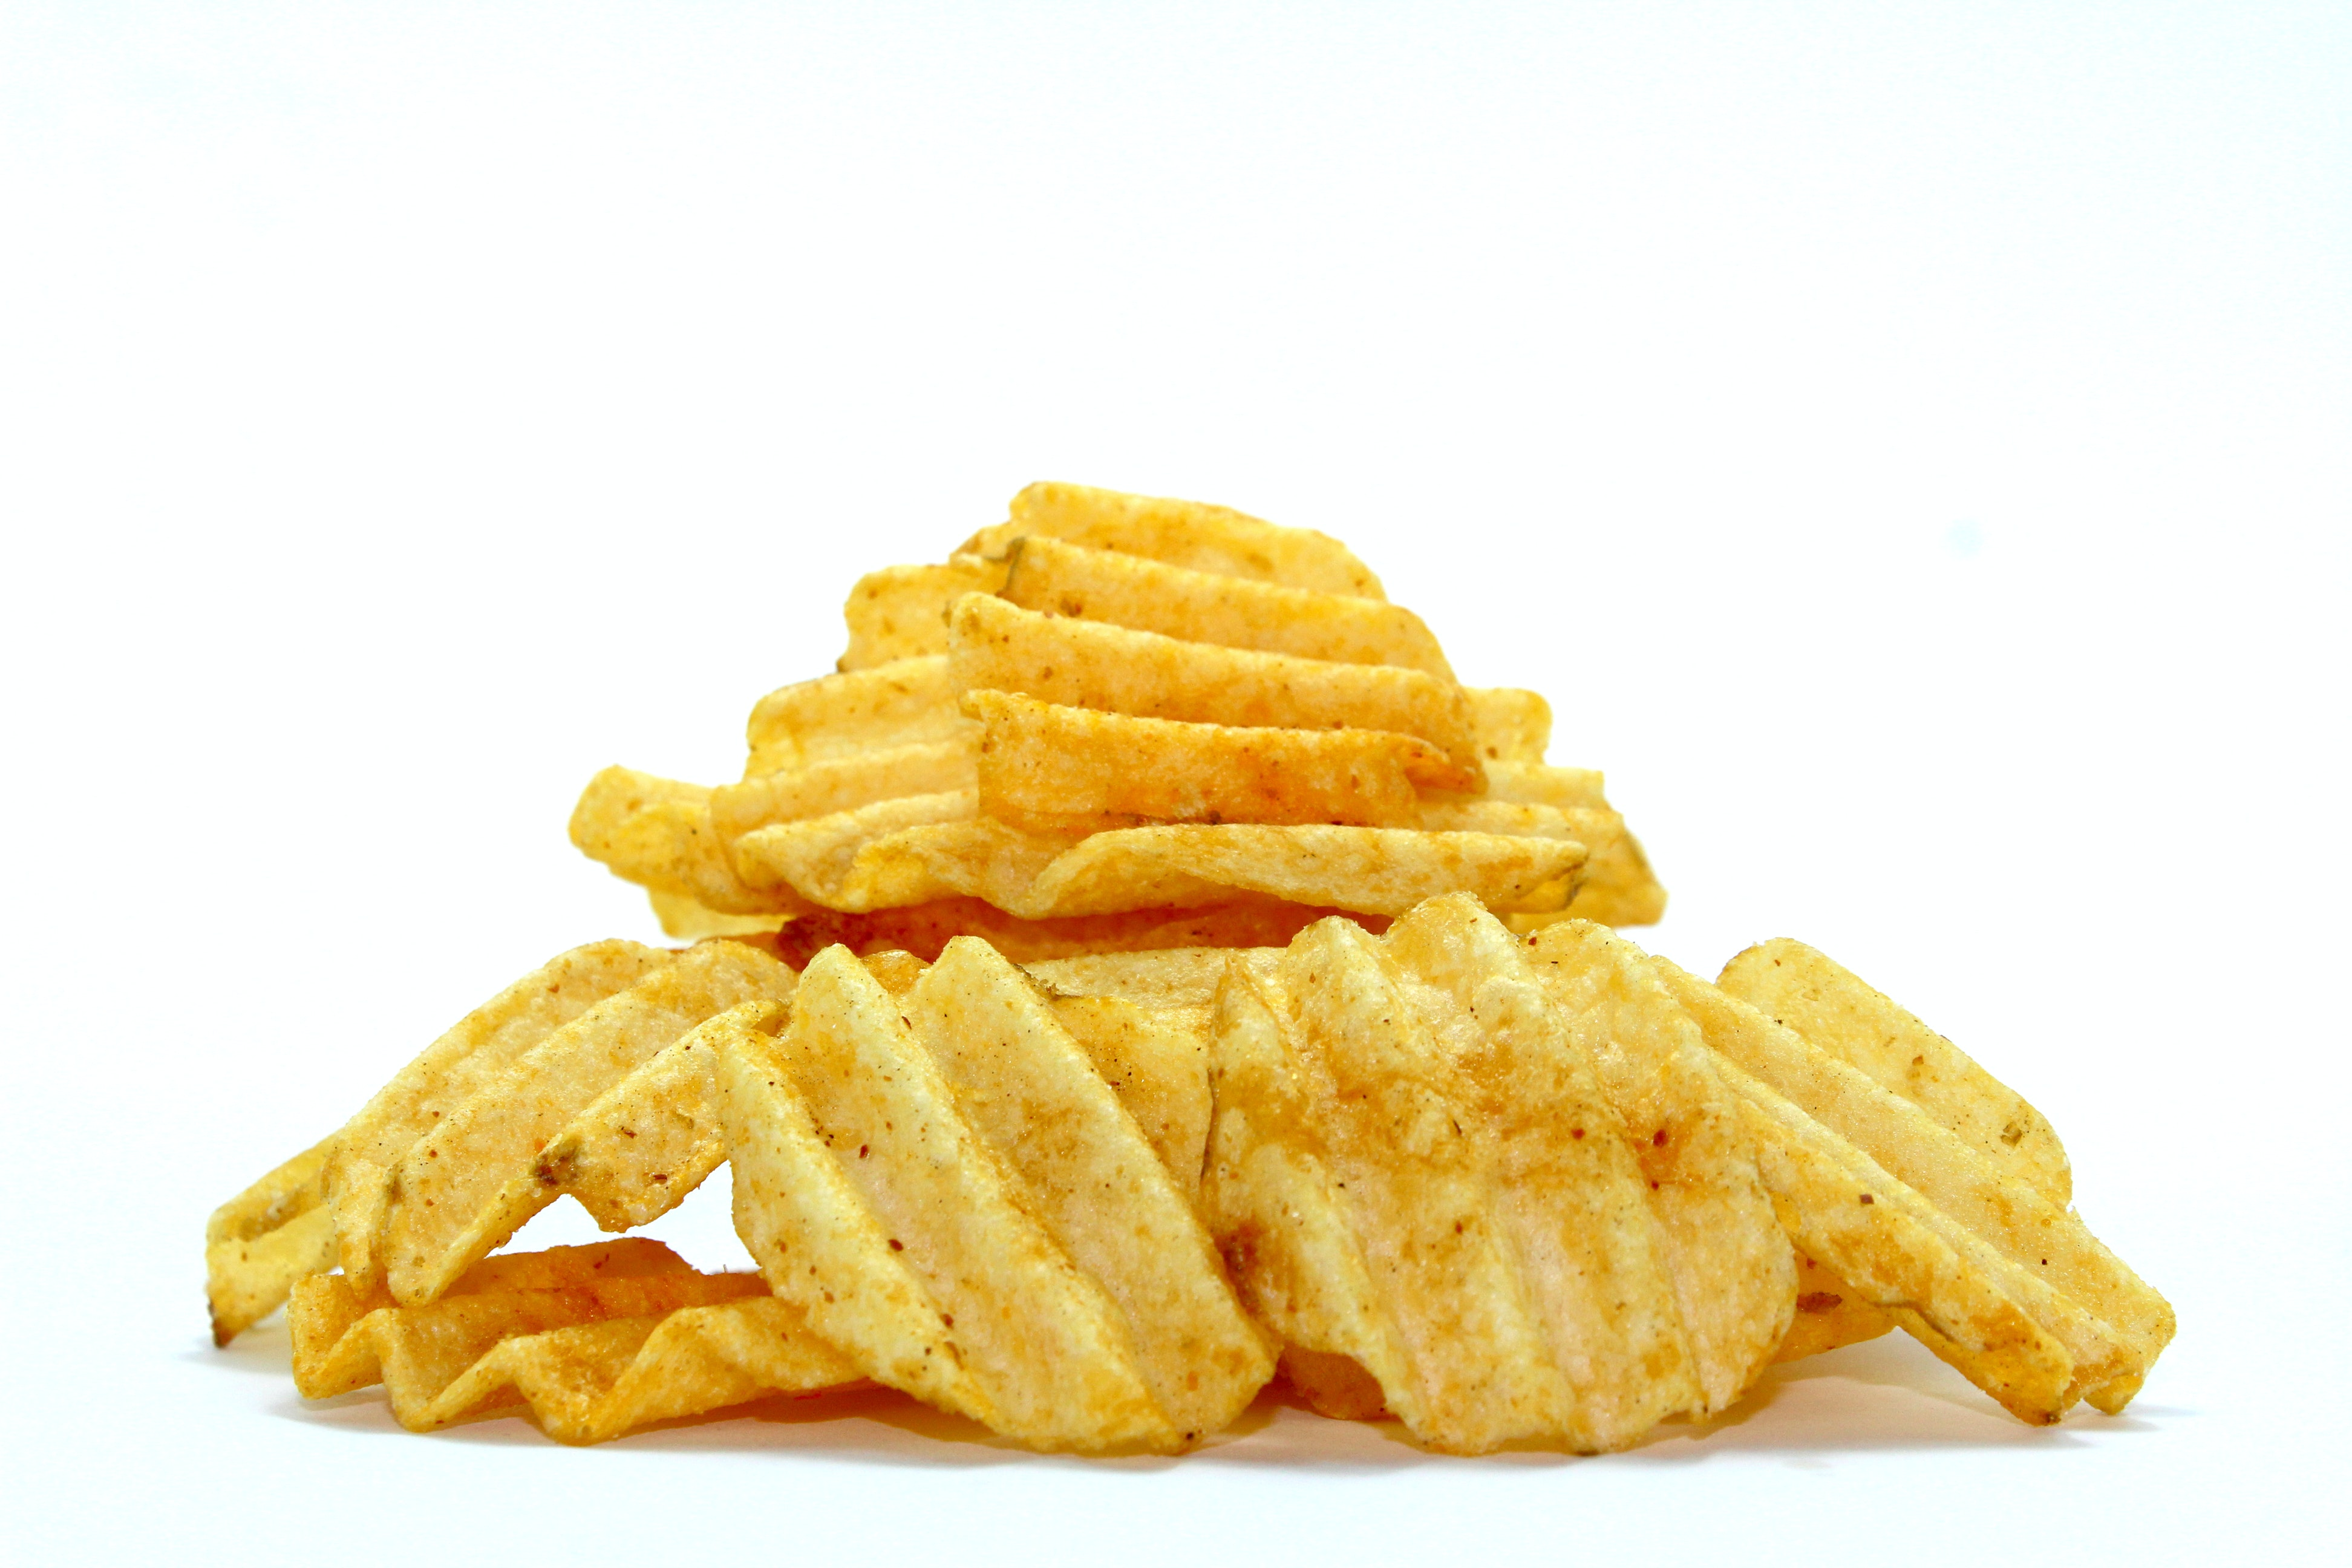 Snack Combo